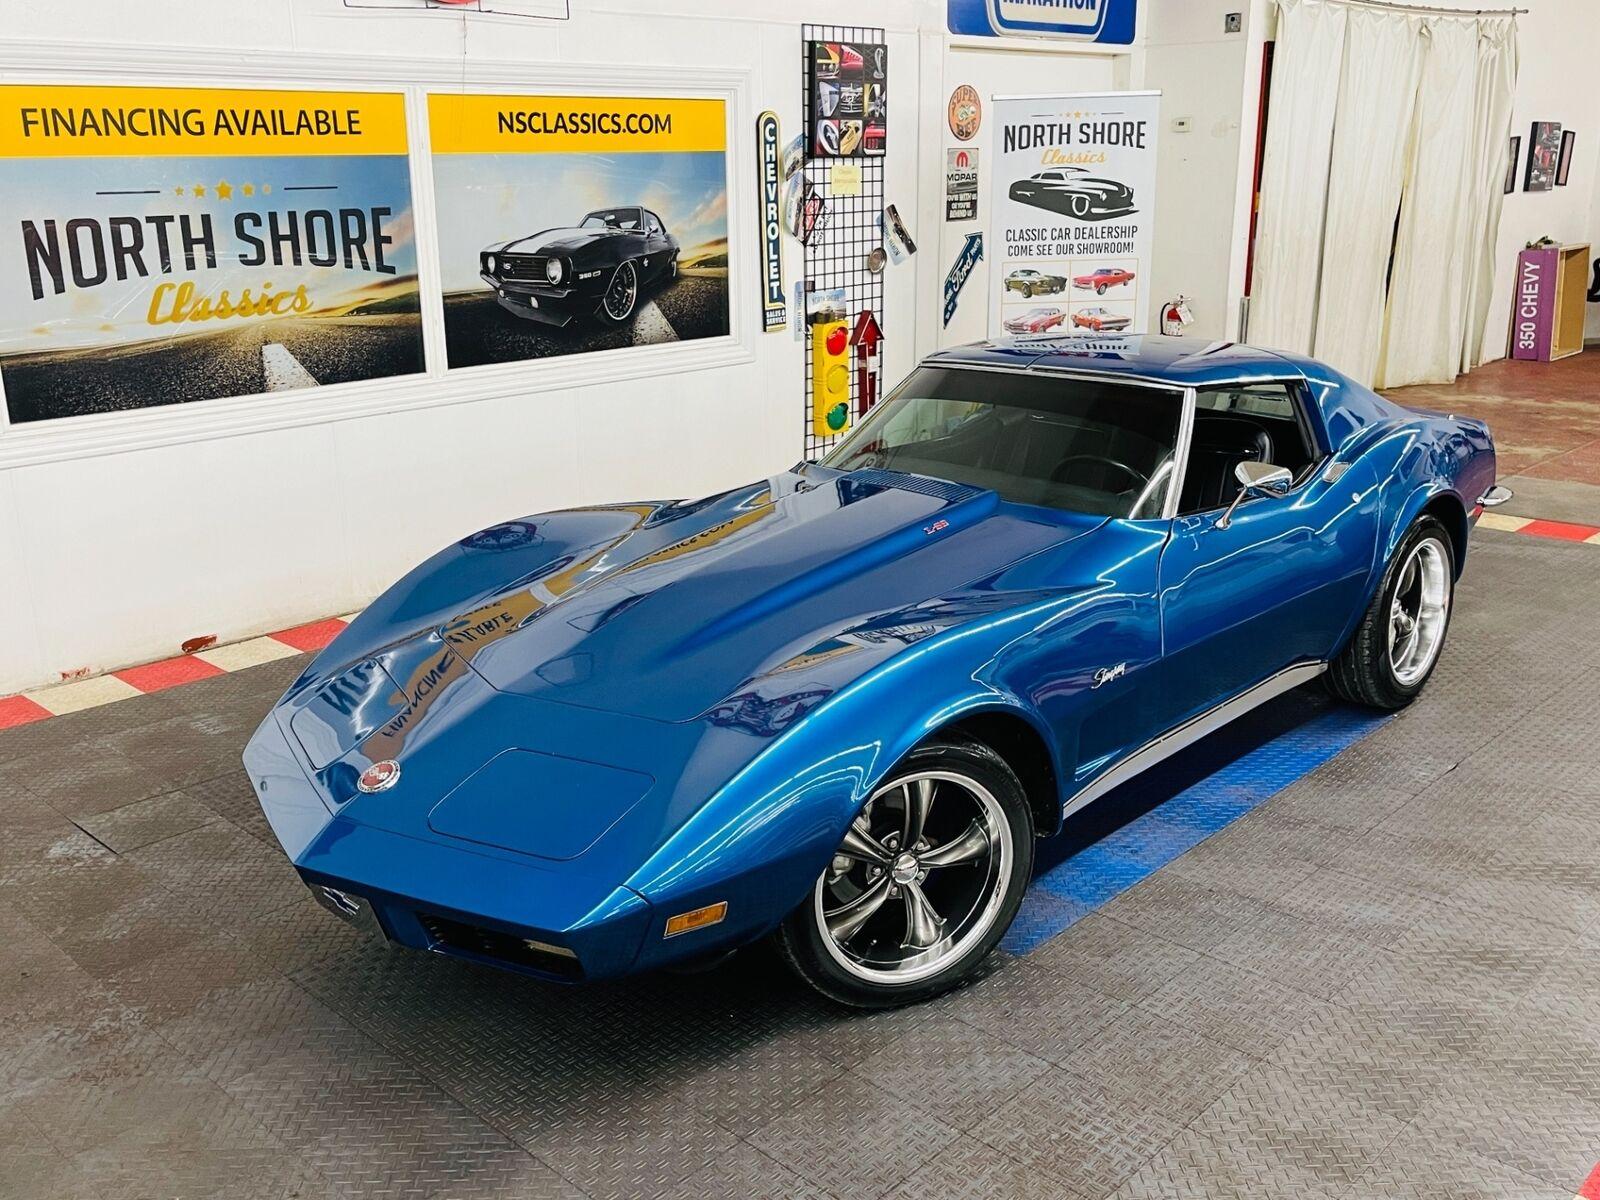 1973 Blue Chevrolet Corvette Coupe  | C3 Corvette Photo 1